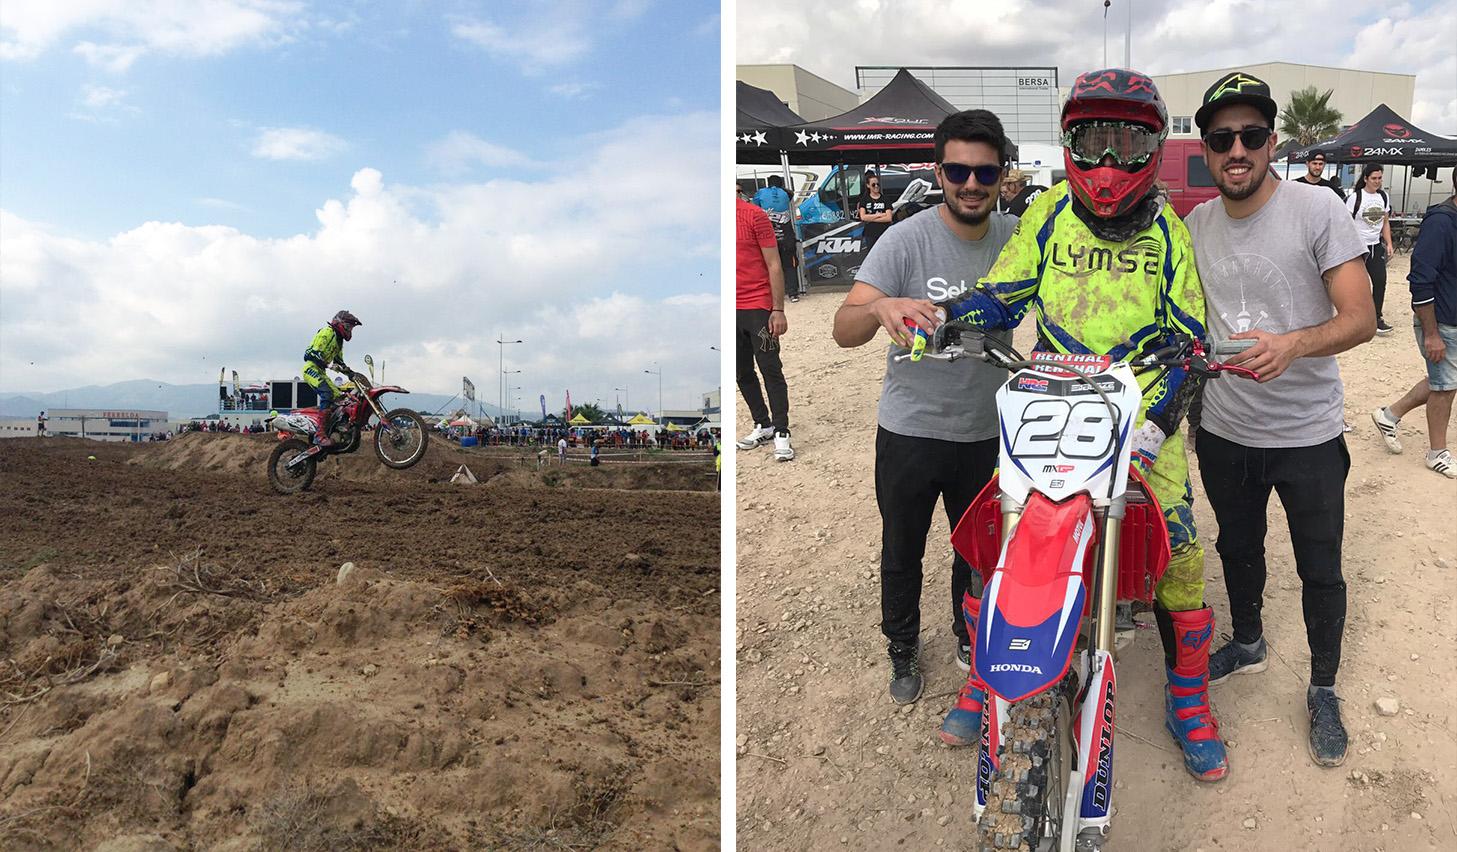 Motocross finca Lacy Elda Héctor Lymsa